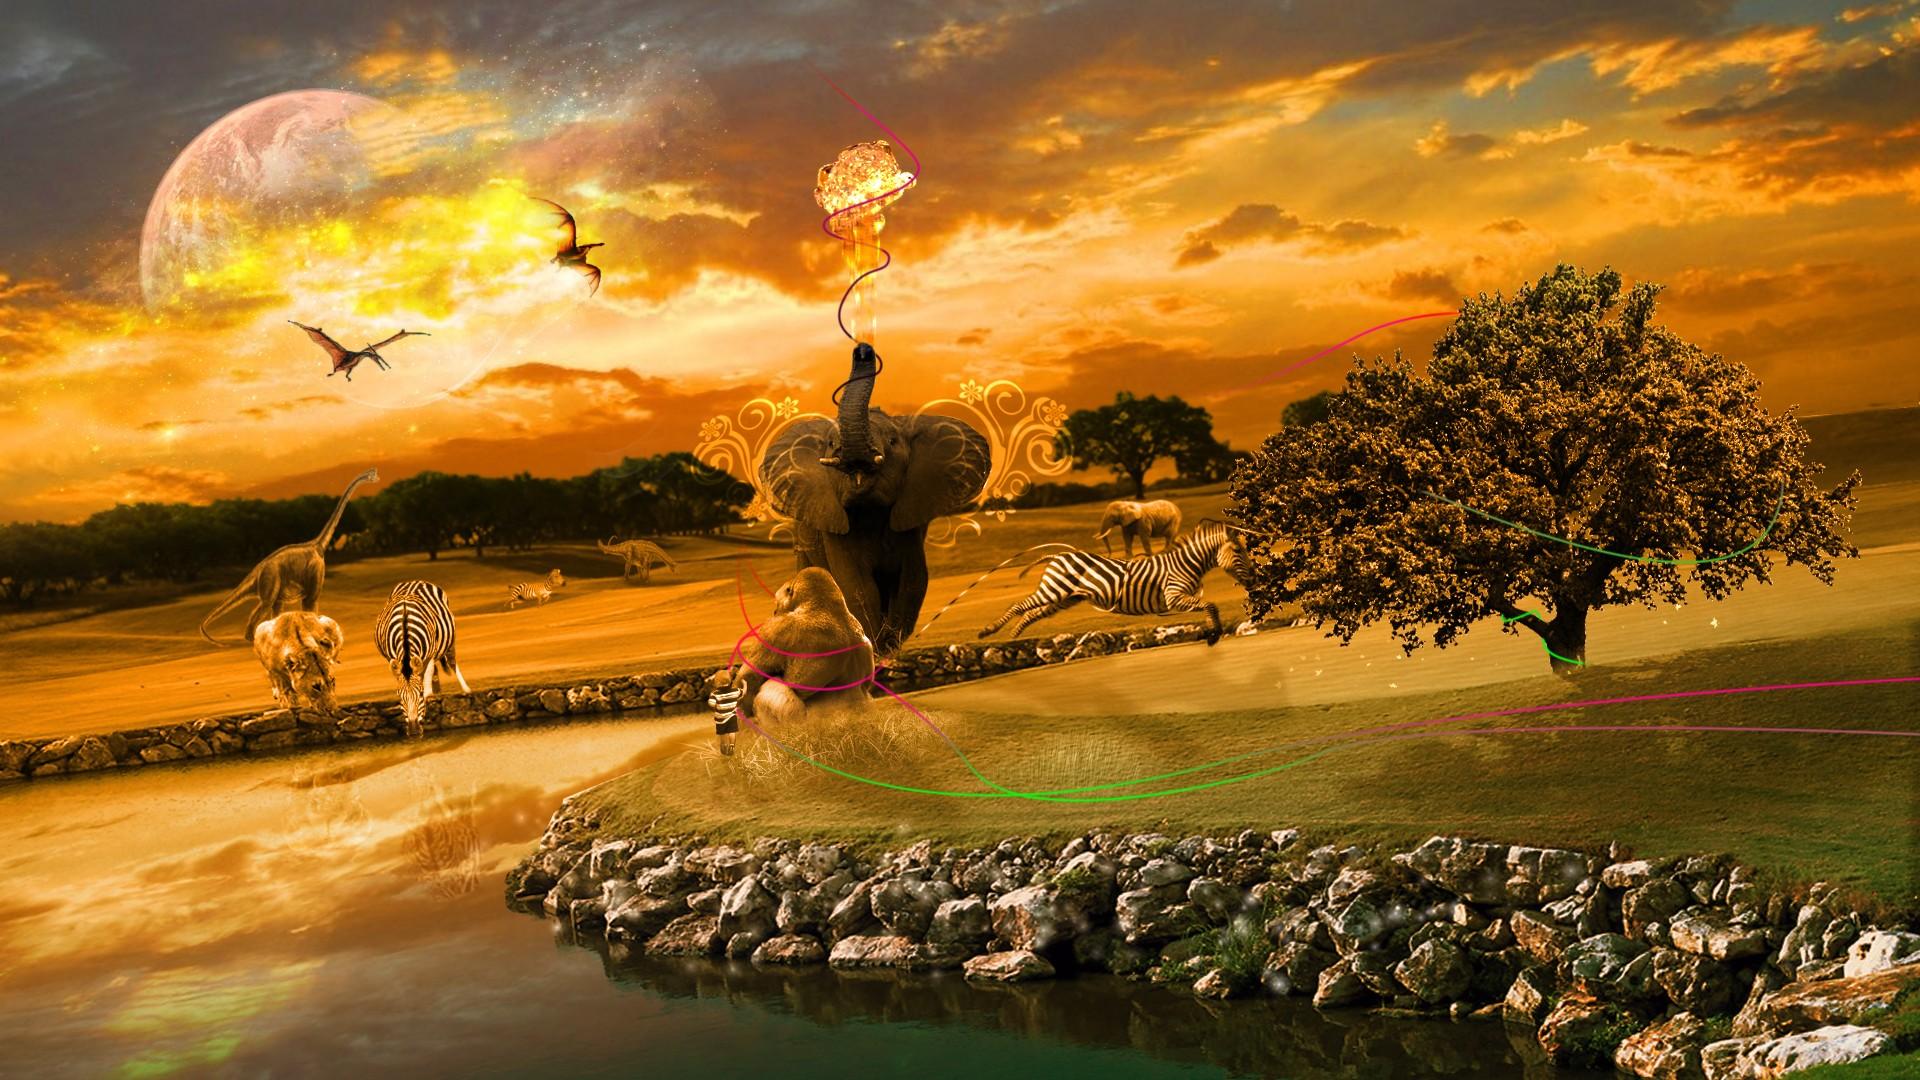 48 Free African Wallpaper For Desktop On Wallpapersafari